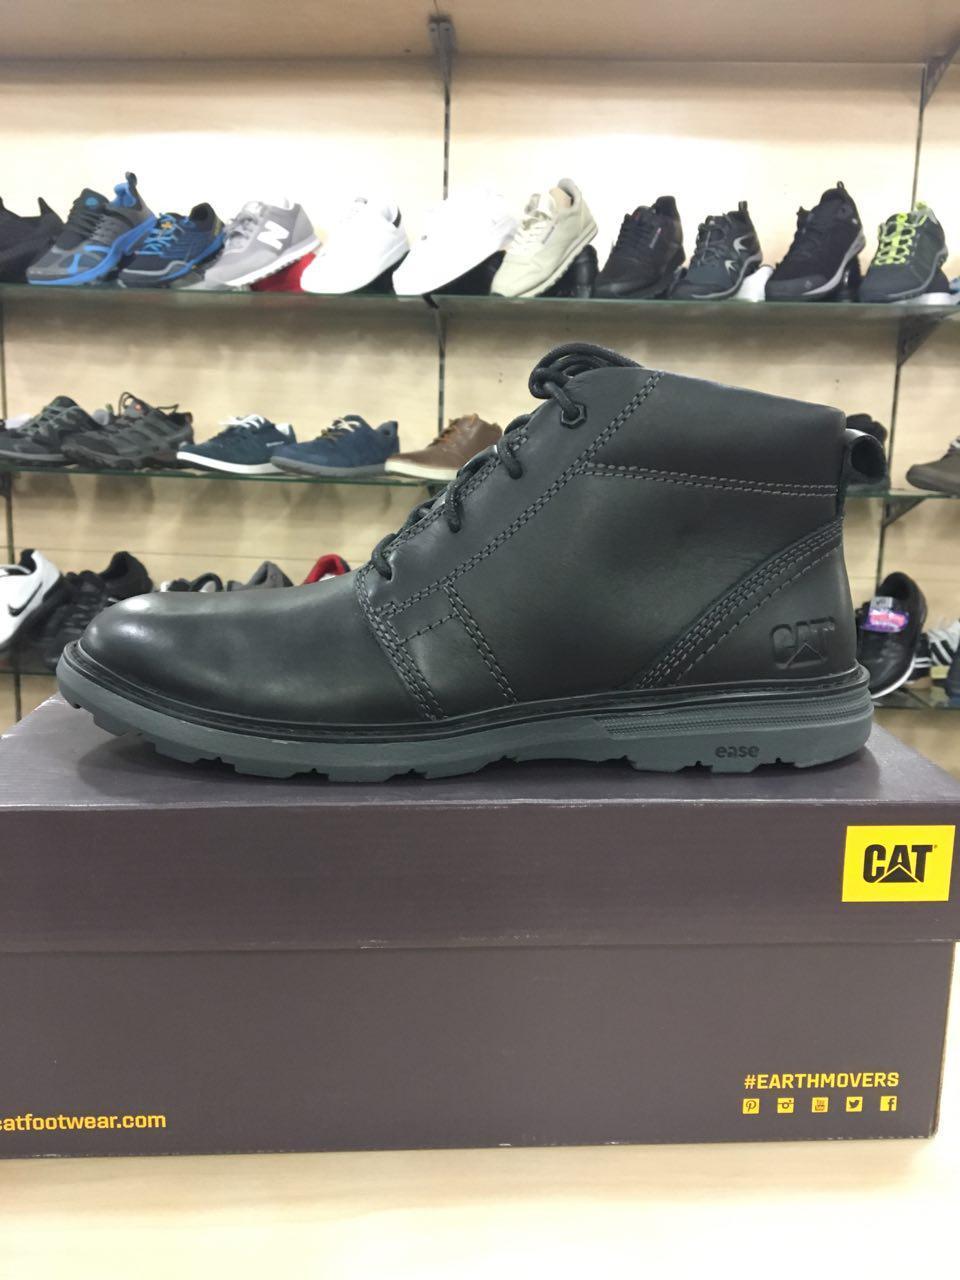 ce48994a9 Ботинки мужские Cat TREY FLEECE Men's insulated boots (Оригинал) -  Спортивный магазин